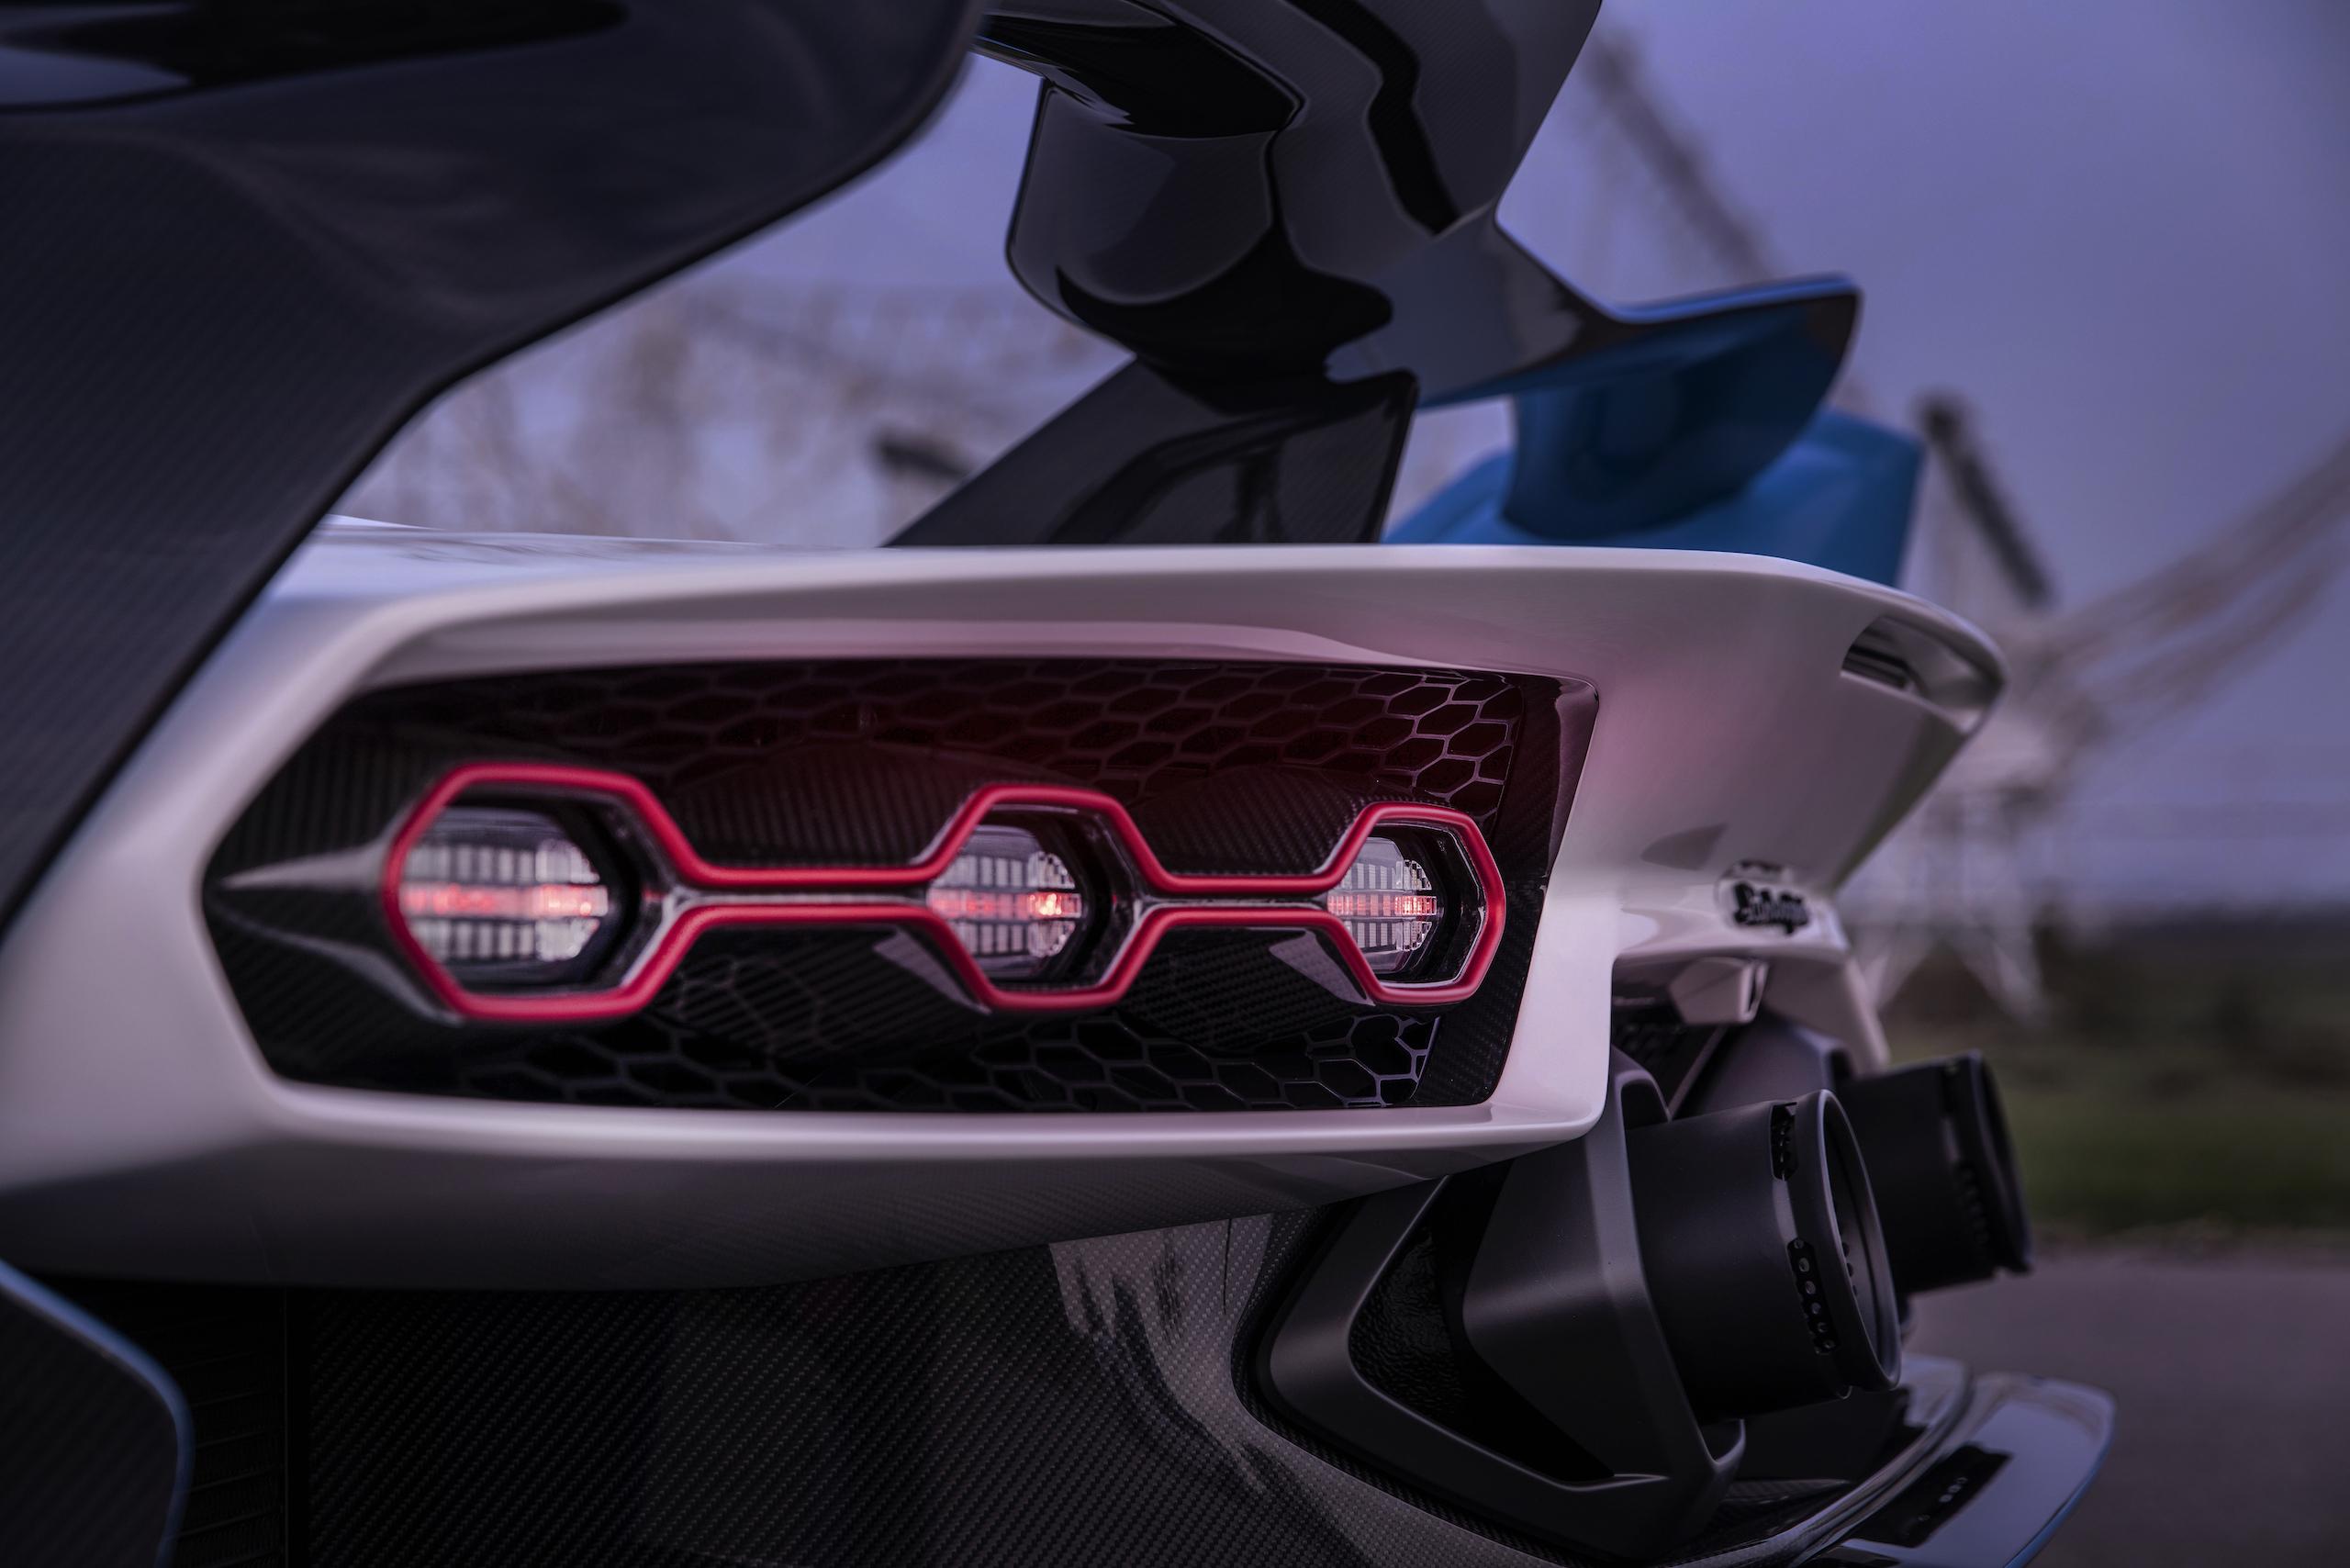 Lamborghini SC20 rear taillights